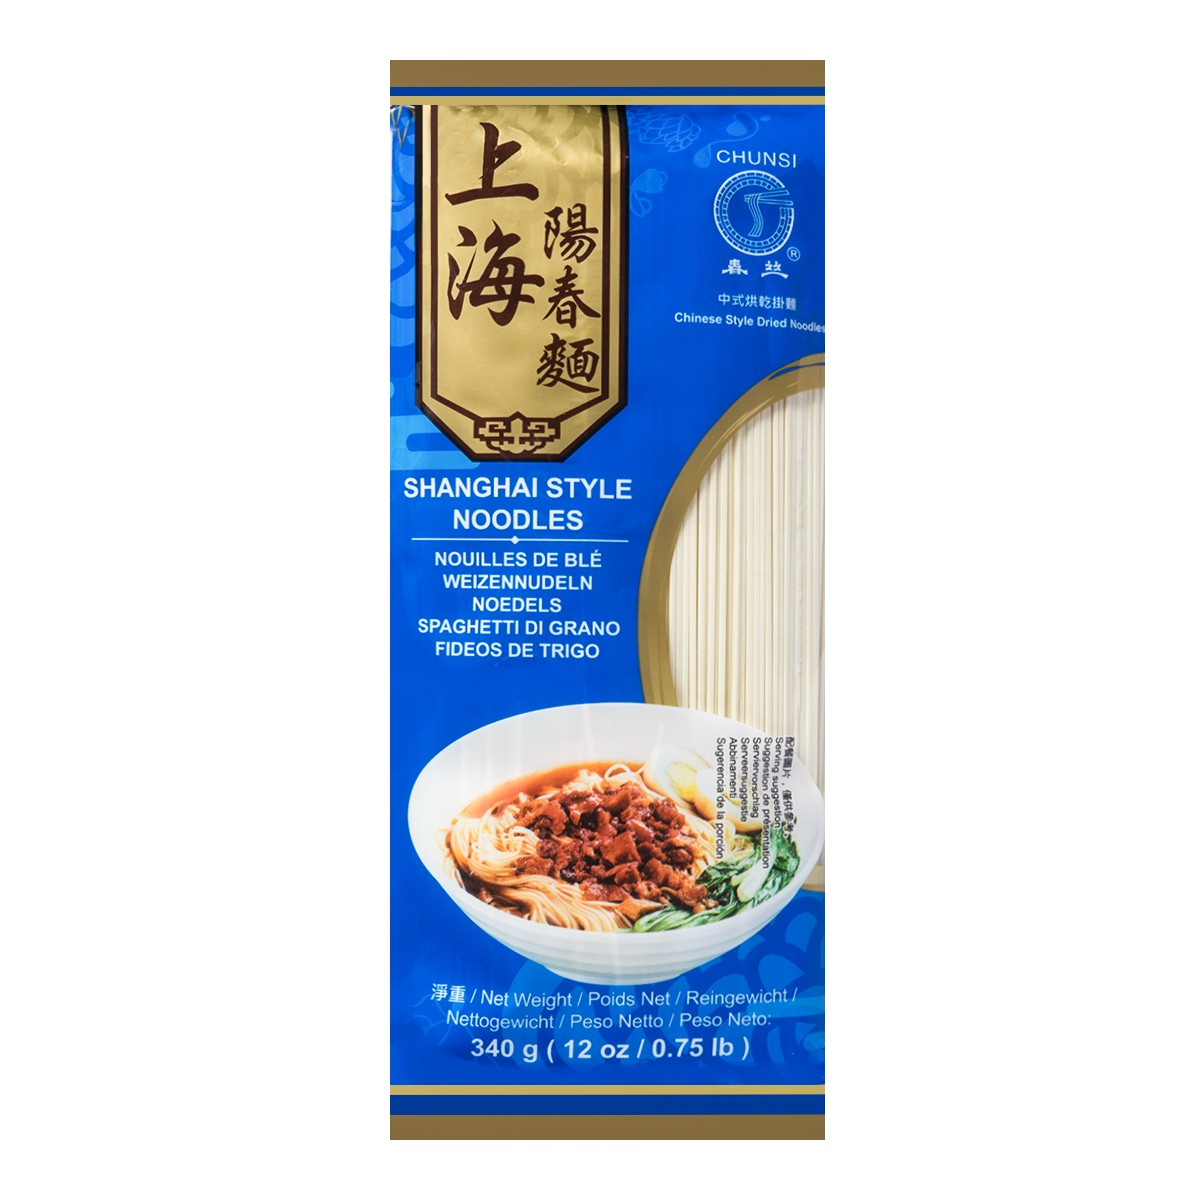 CHUNSI Shanghai Style Noodles 340g